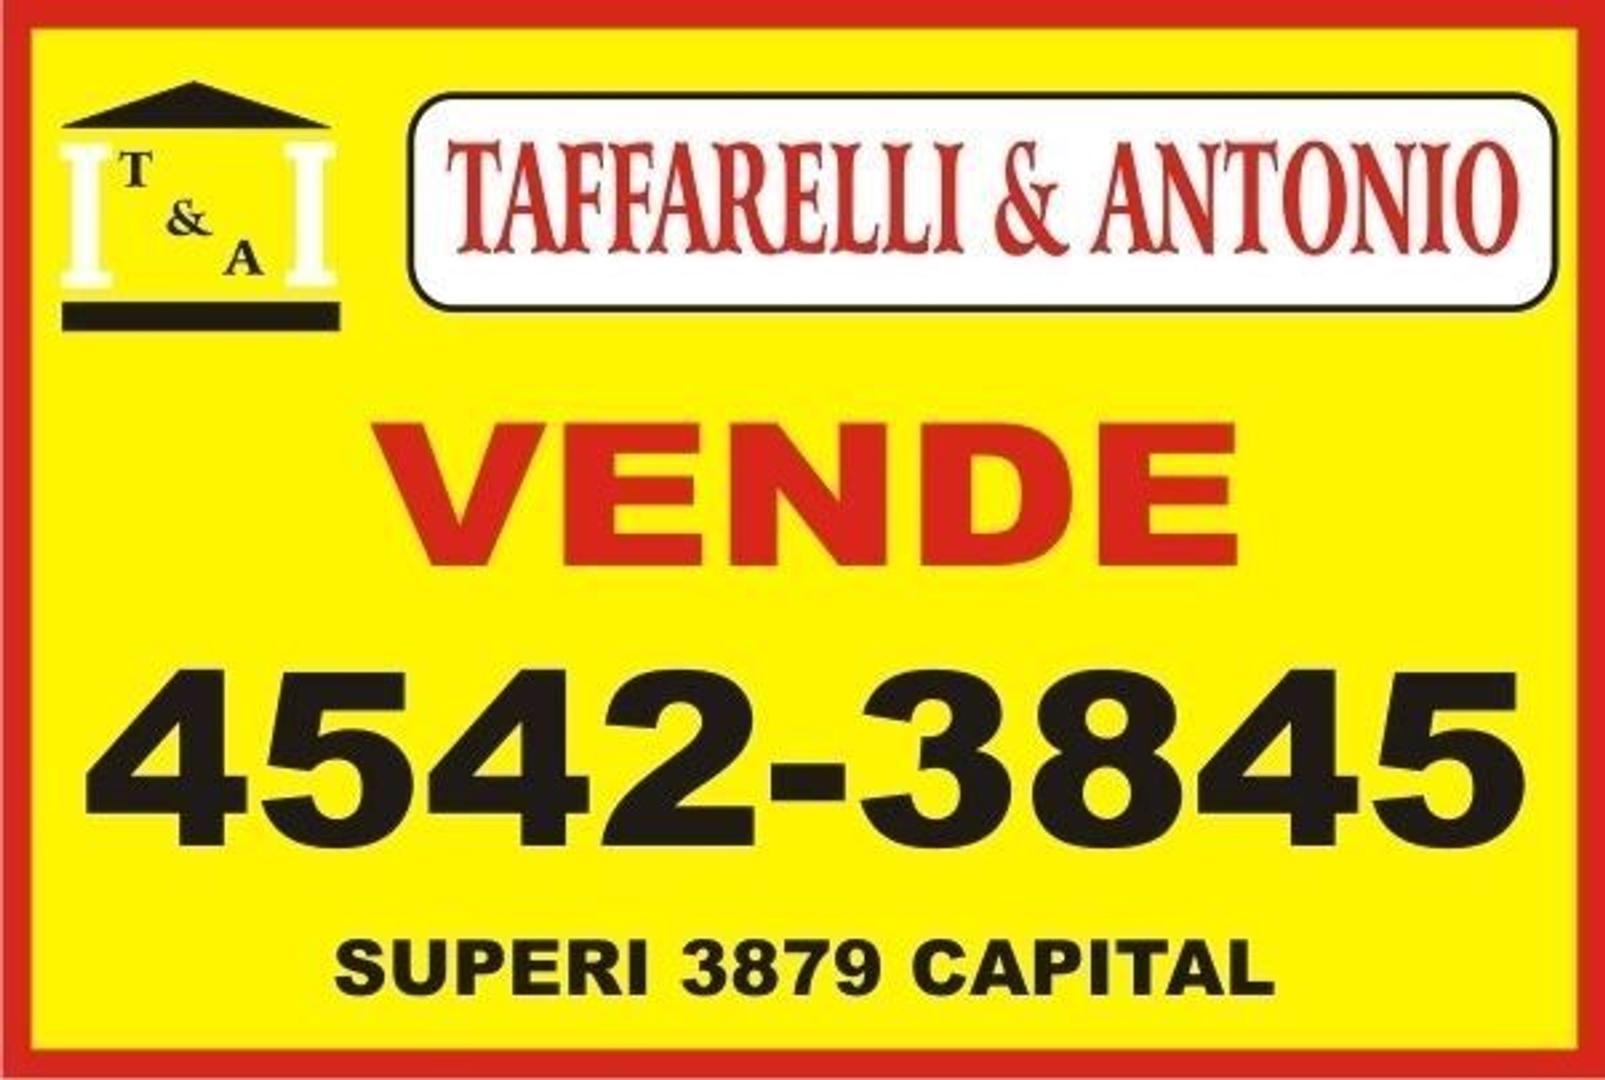 EXCELENTE LOTE  S/AV.  BALBIN Y JARAMILLO- SALIDA A 2 CALLES - FOT LIBRE - APTO 1200 m2- OR. ESTE -